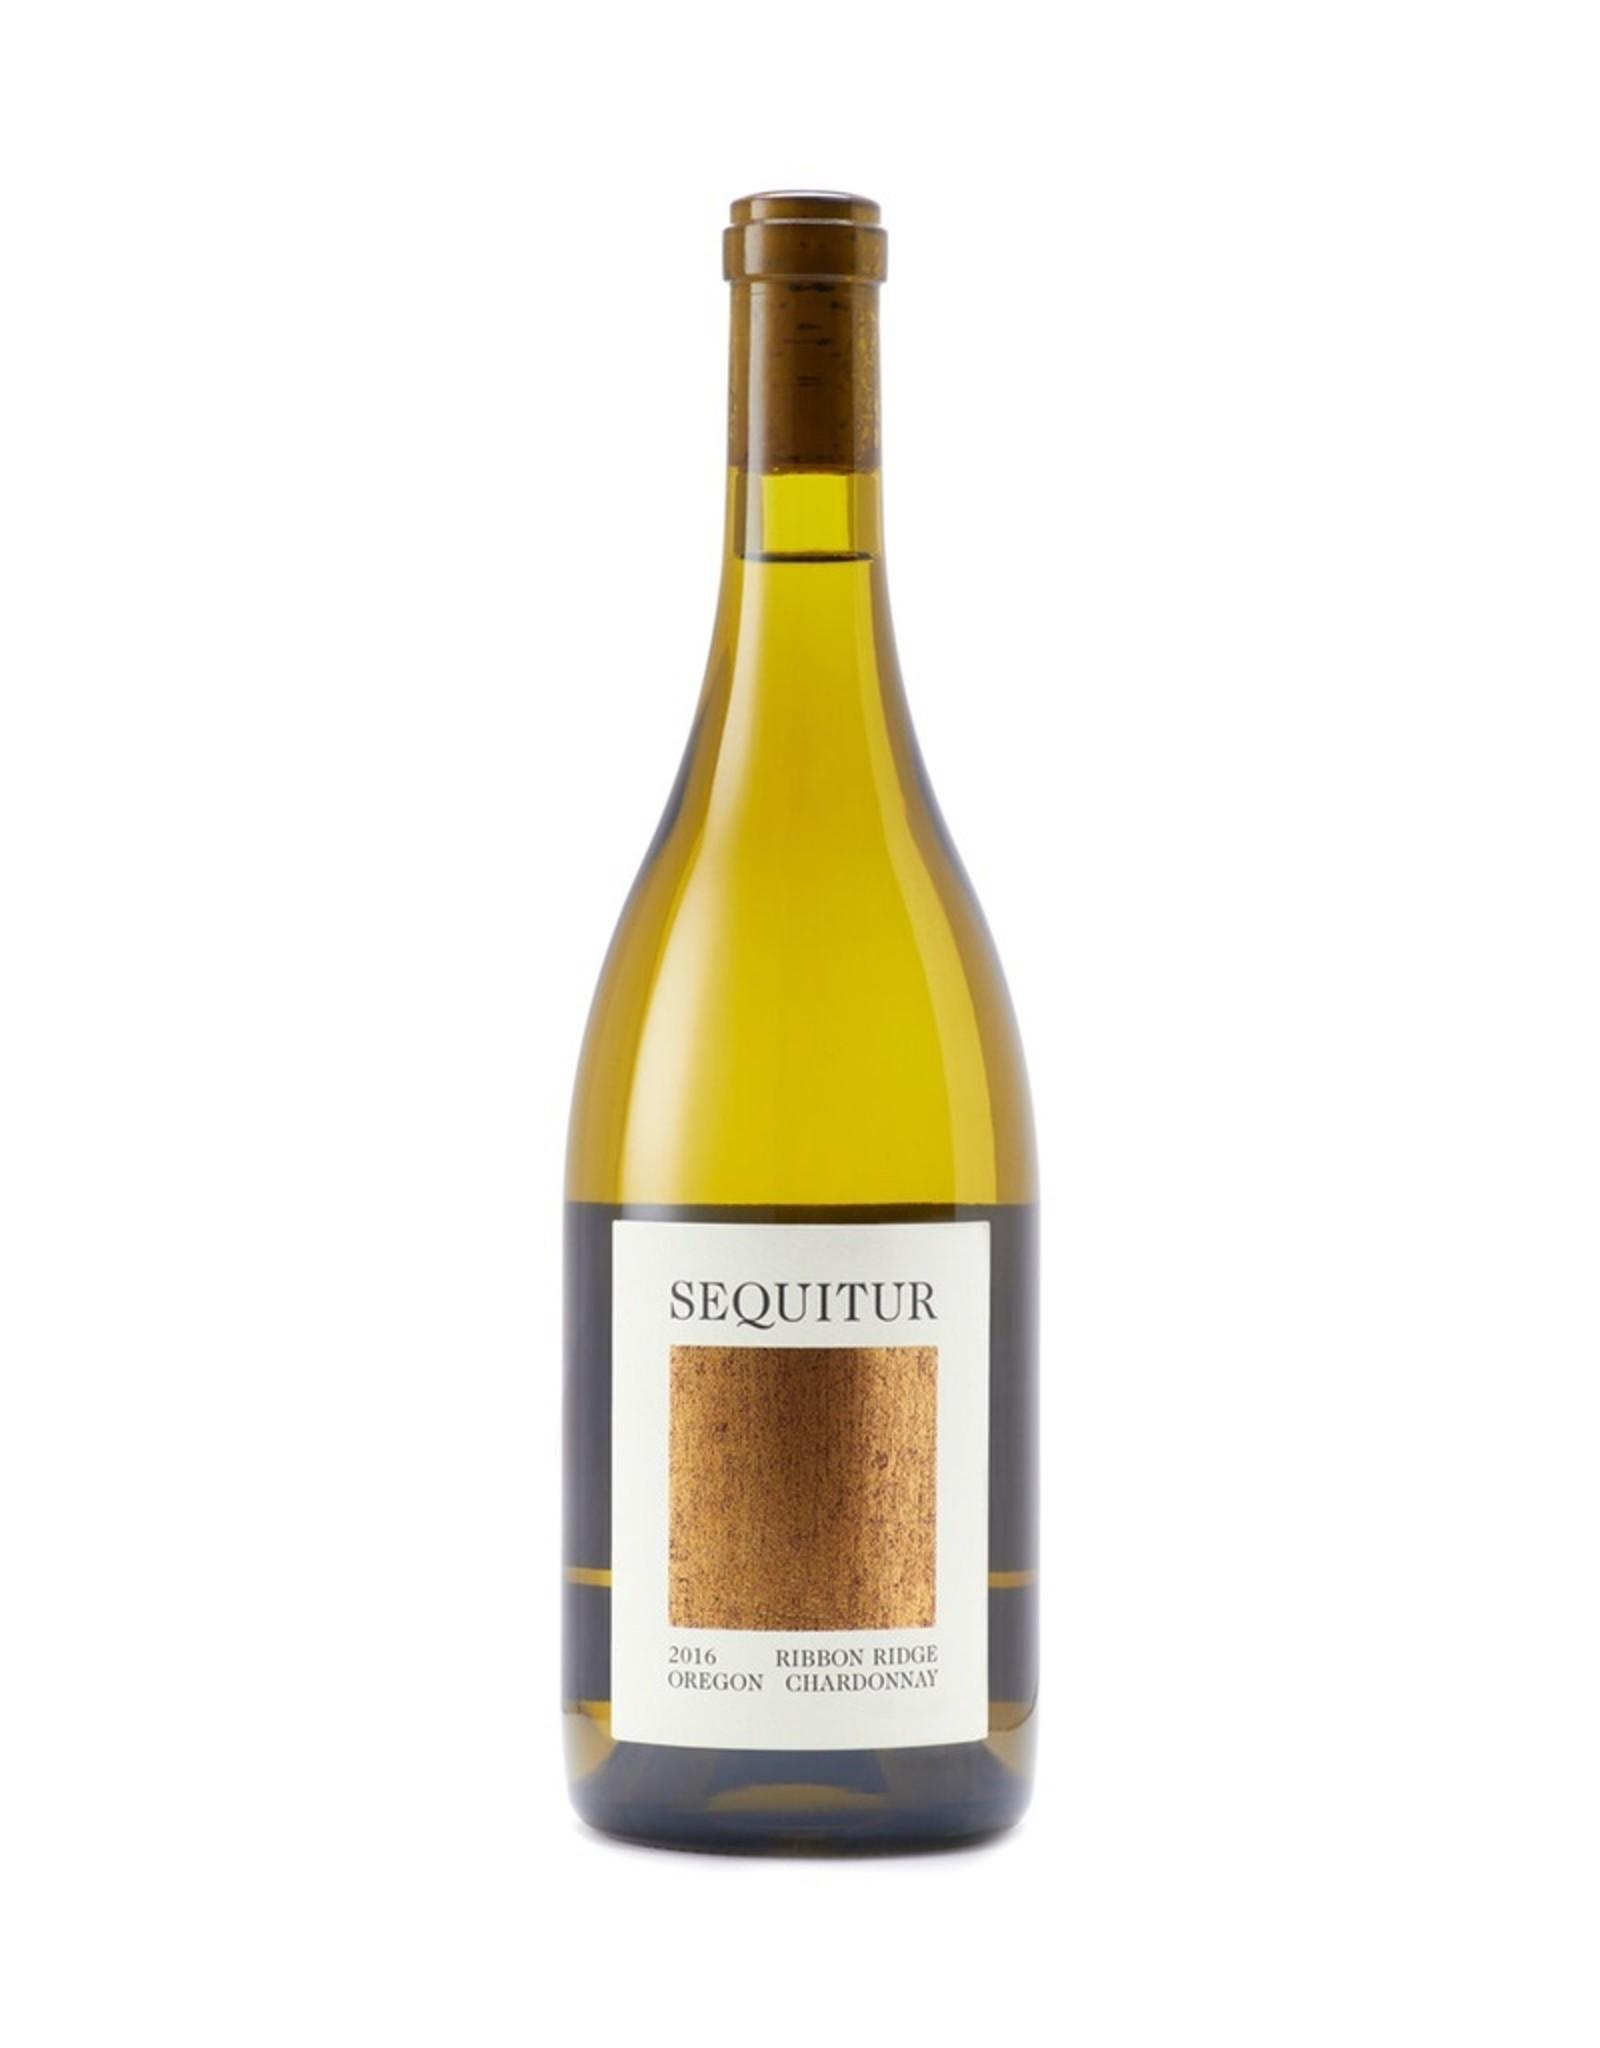 Sequitur Chardonnay Ribbon Ridge Oregon 2016